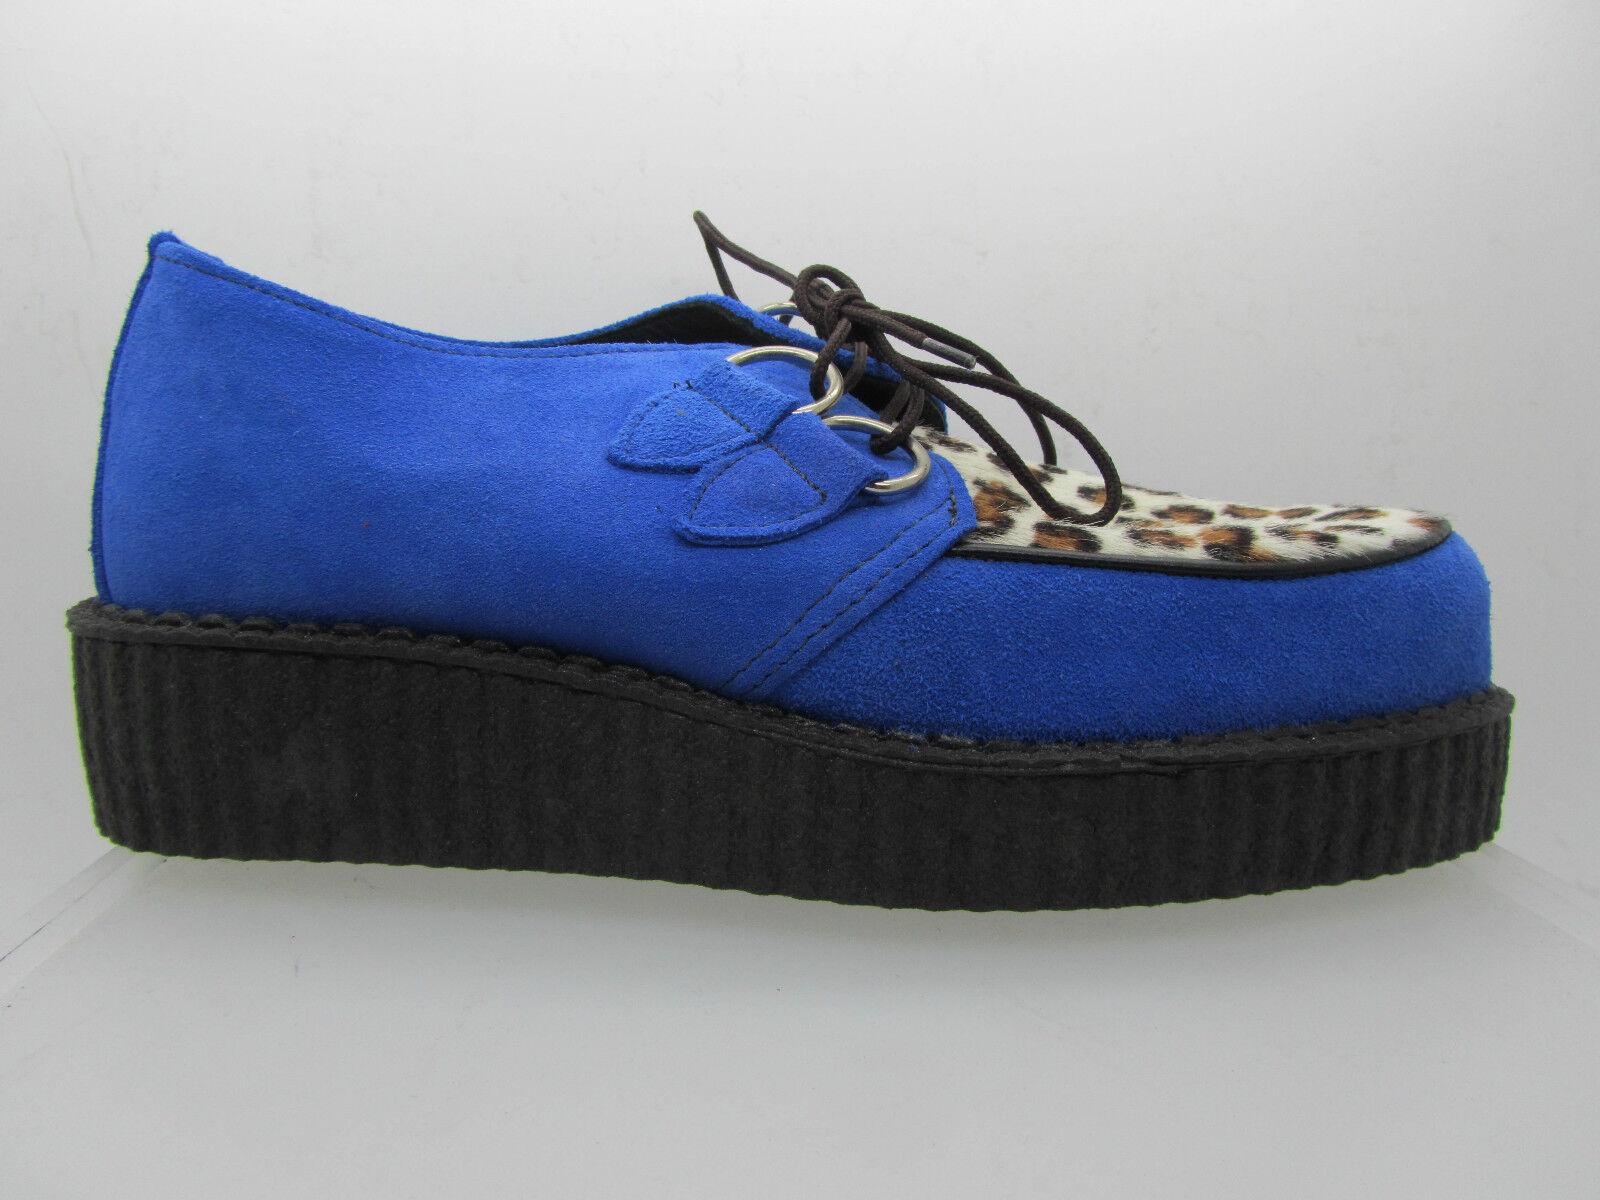 NEU Rare Retro Hand Made Uk Schuhes Blau Suede Lepoard Creepers Rock Punk